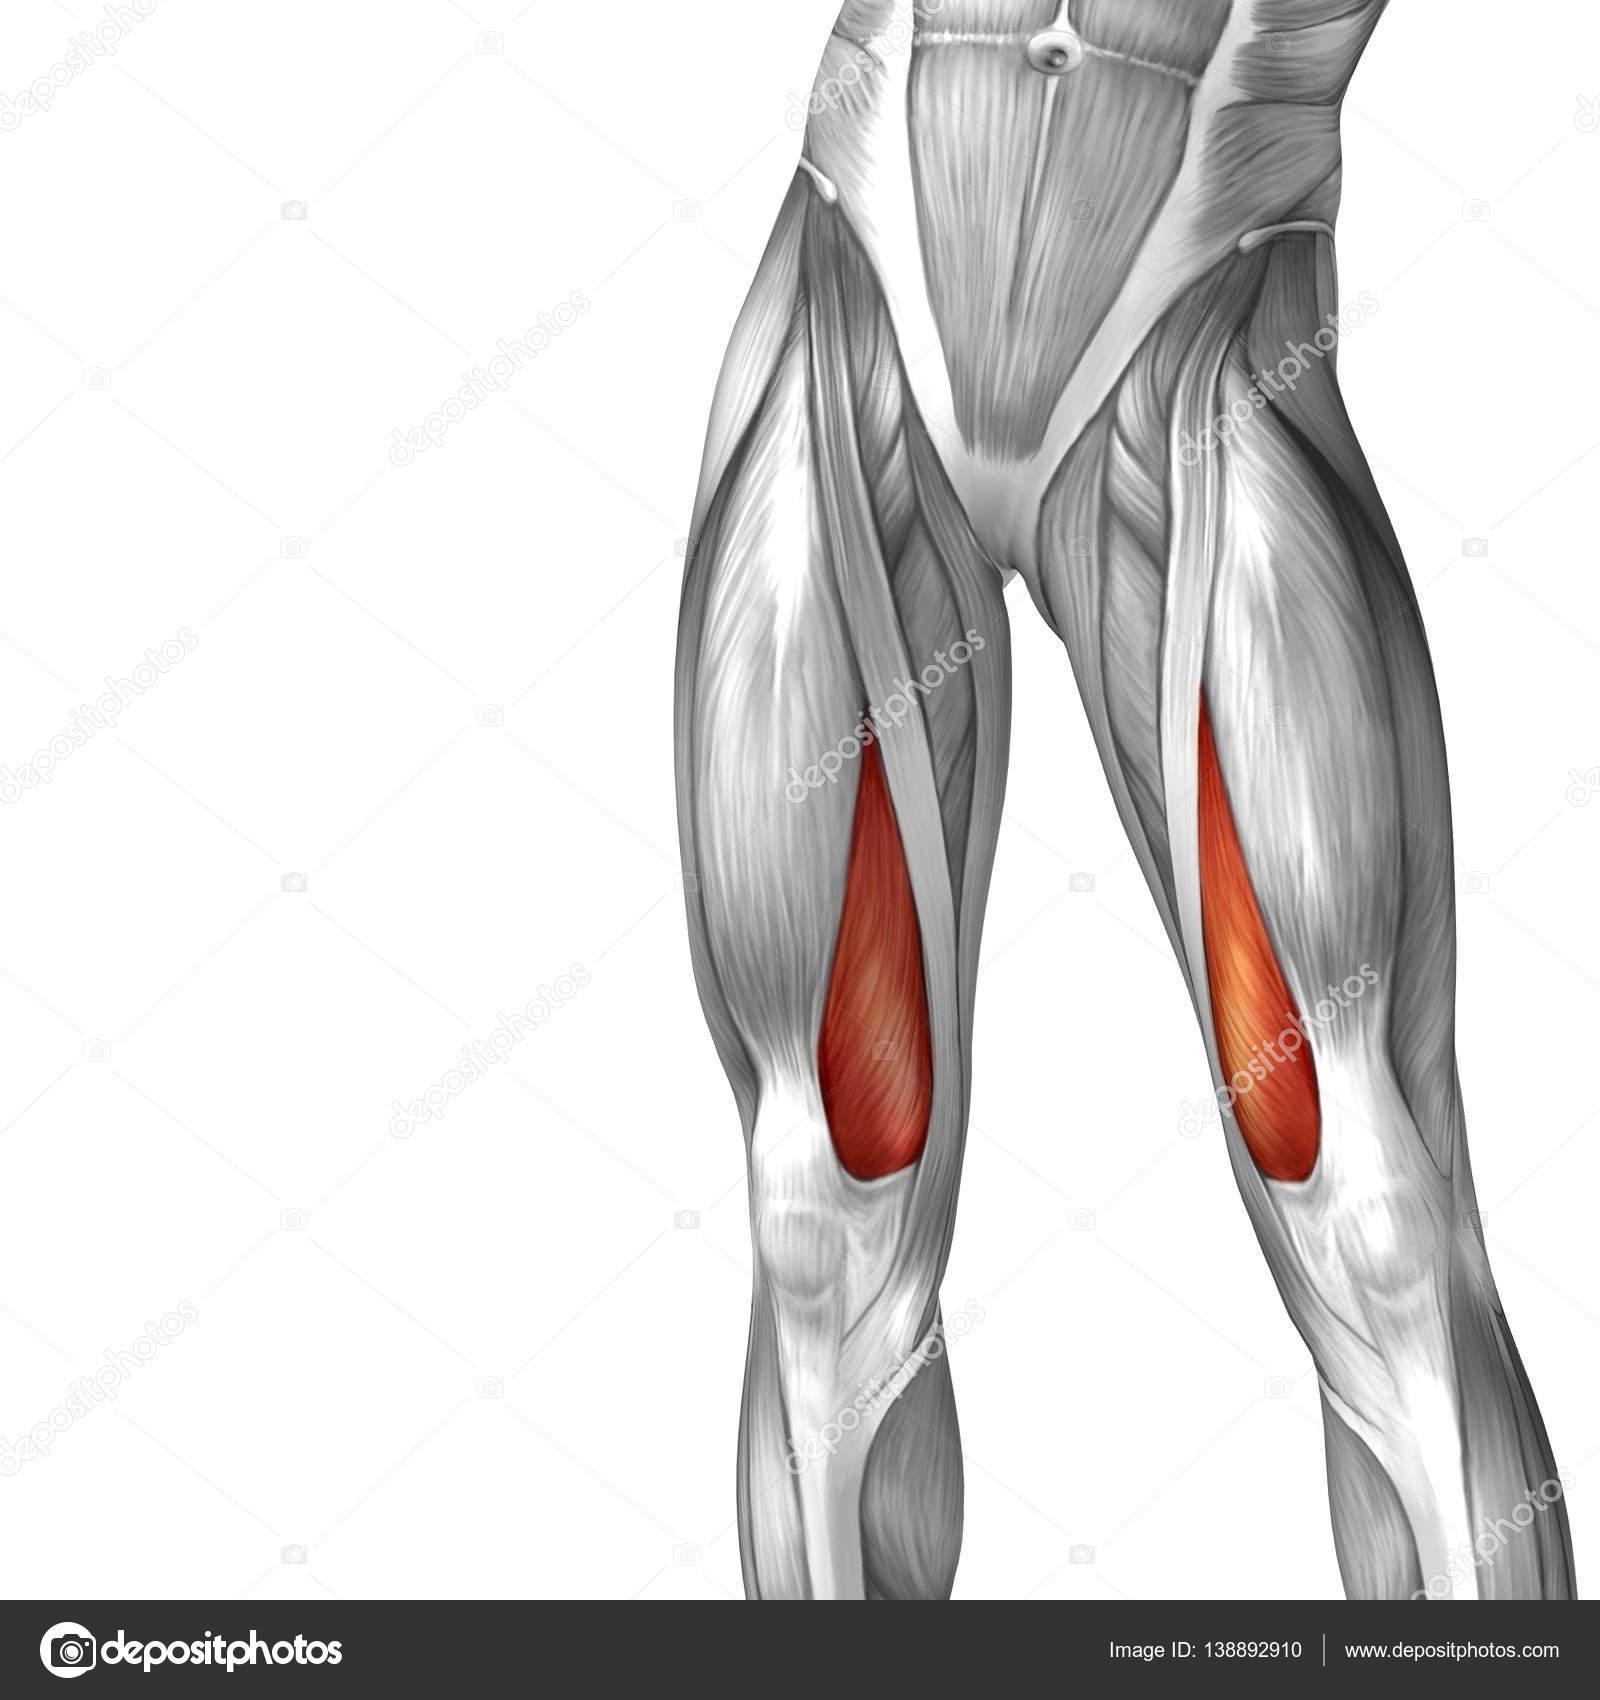 human upper leg anatomy — Stock Photo © design36 #138892910